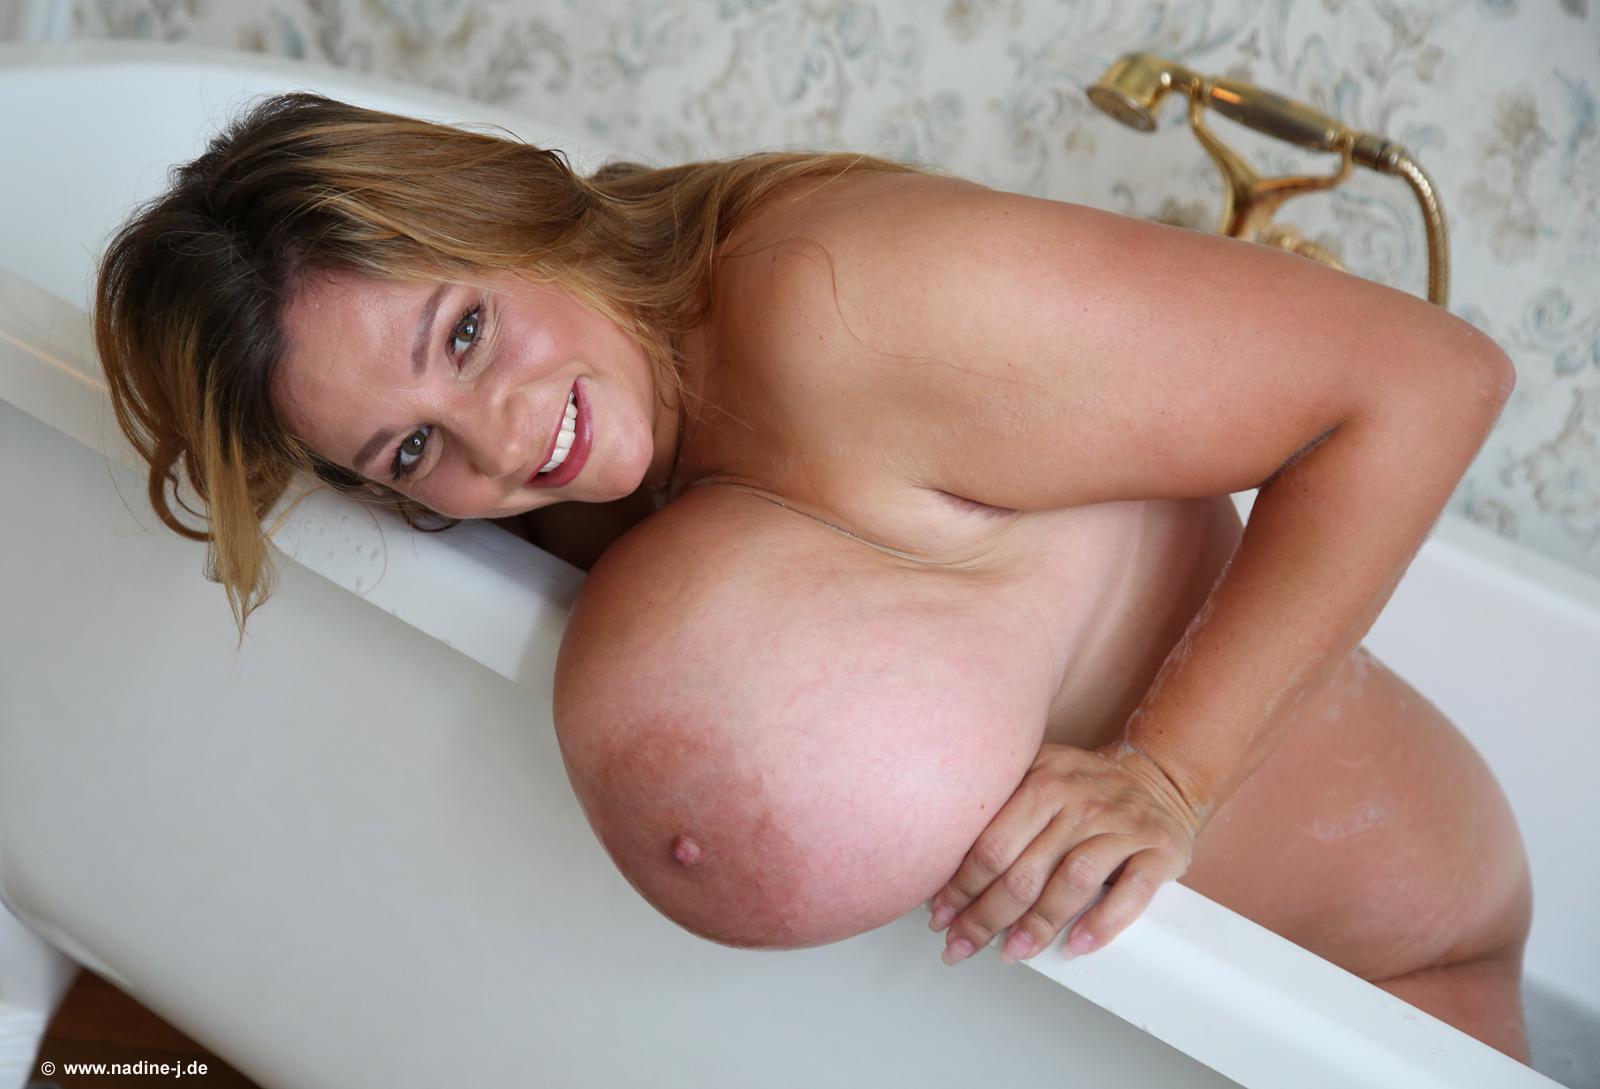 Massive breasts jansen nadine